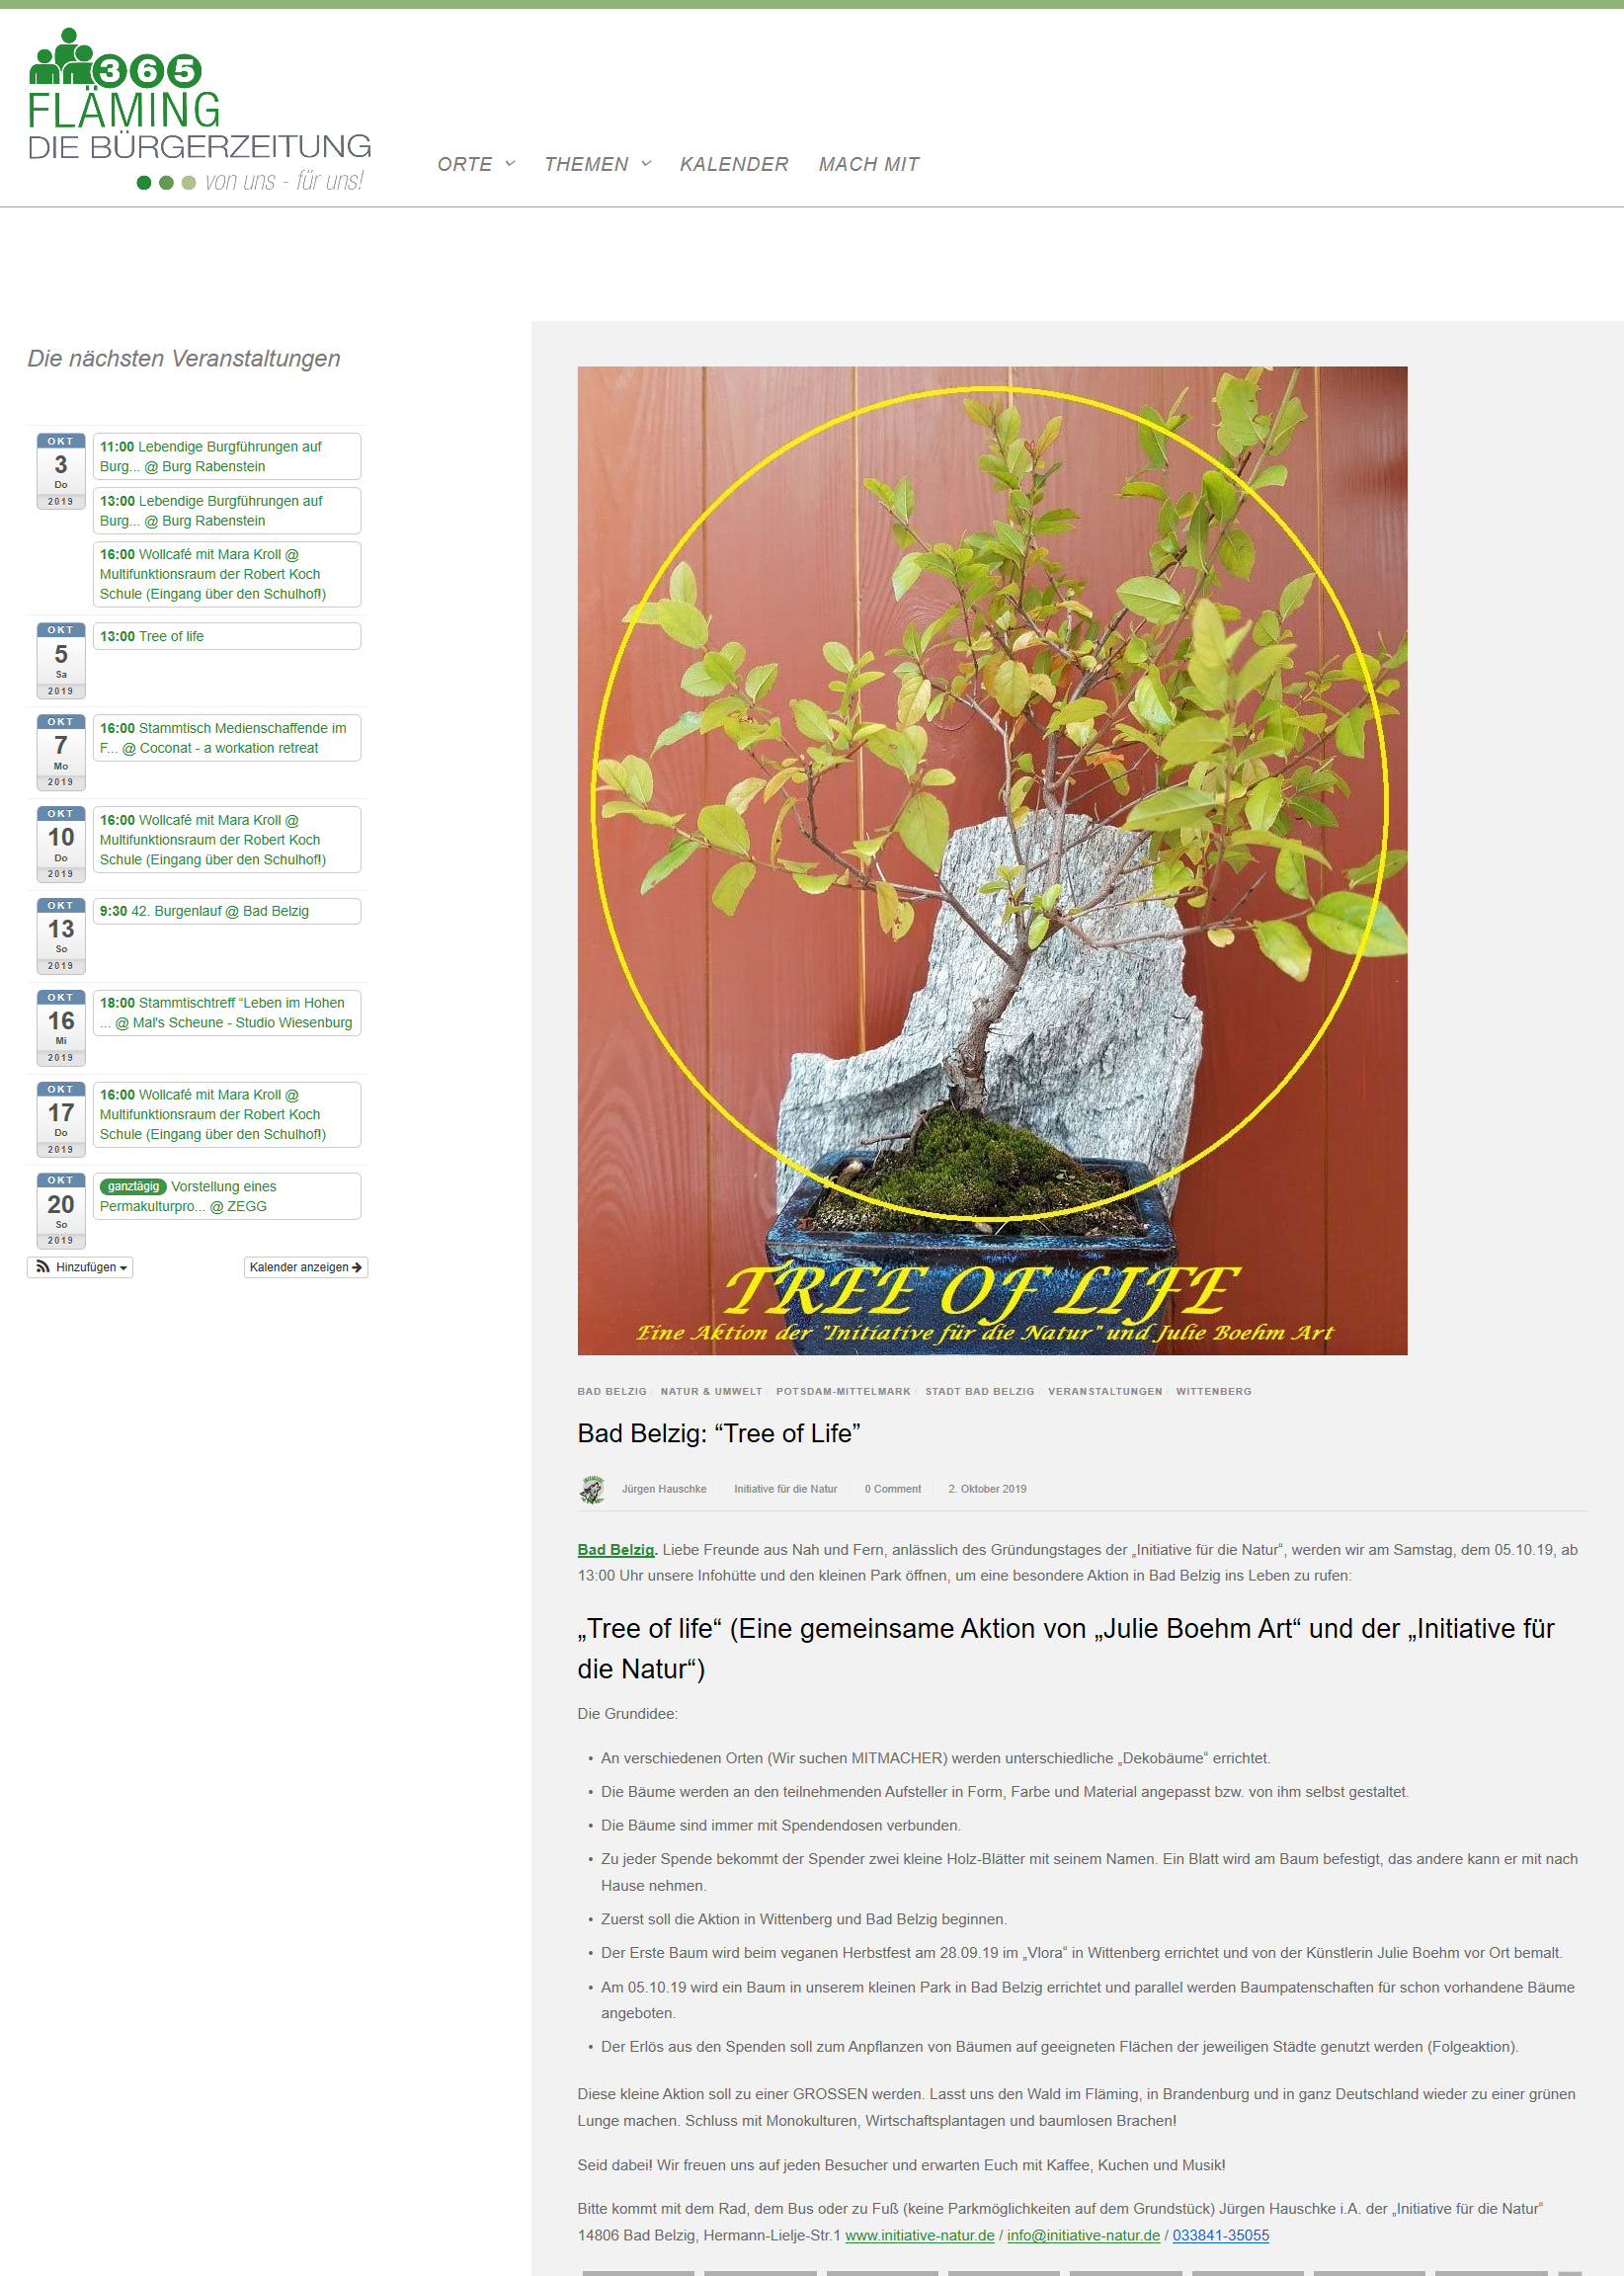 191002_flaemingBuergerzeitung_Tree of Life 01 BadBelzig_ Cafe Vlora Kickoff